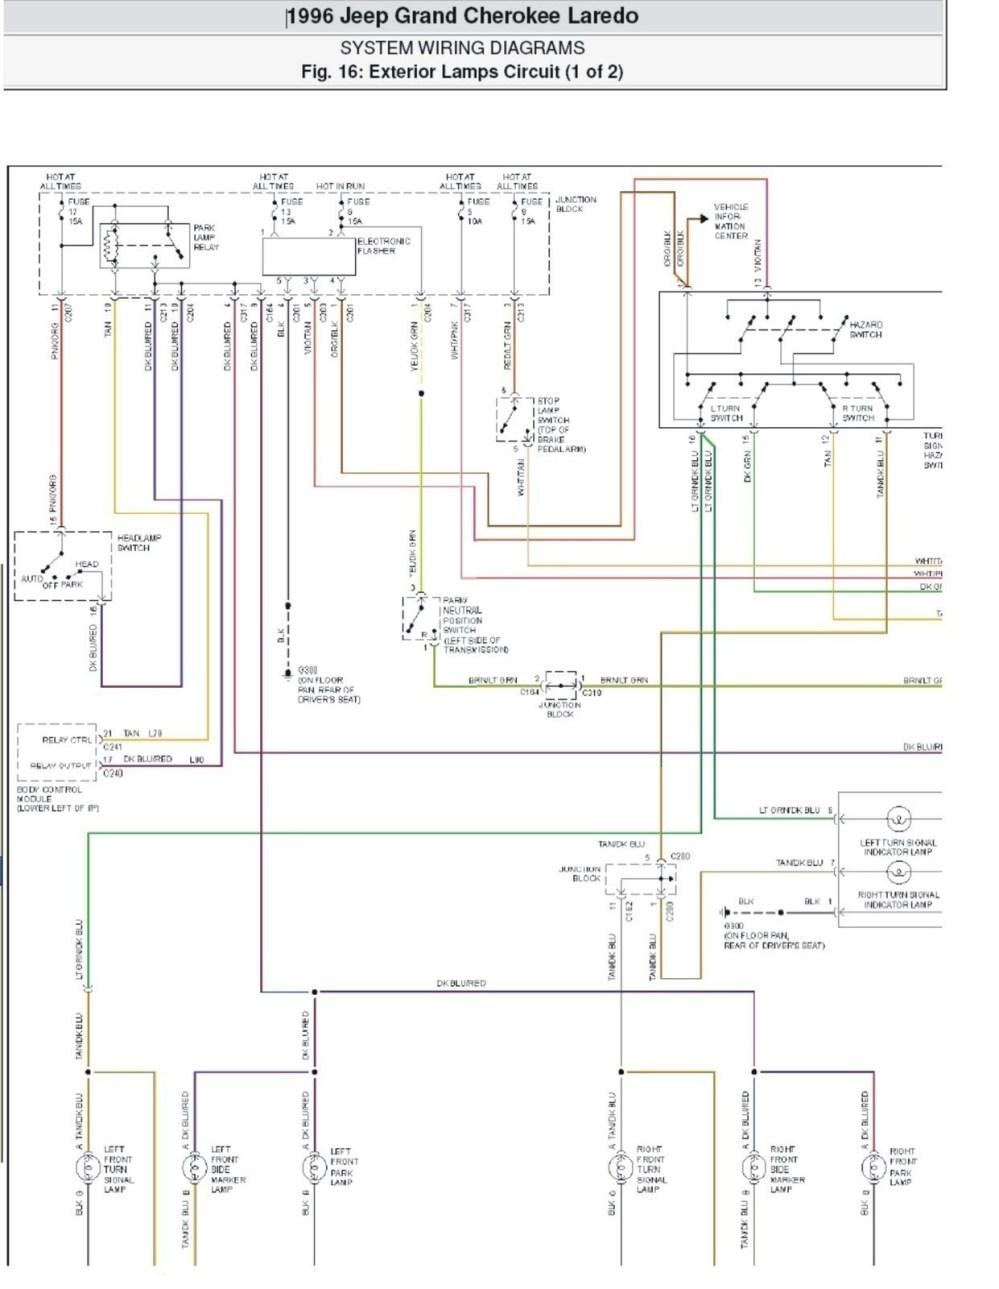 medium resolution of 2000 jeep grand cherokee laredo powertrain wiring harness 92 jeep cherokee alternator wiring 2000 jeep cherokee